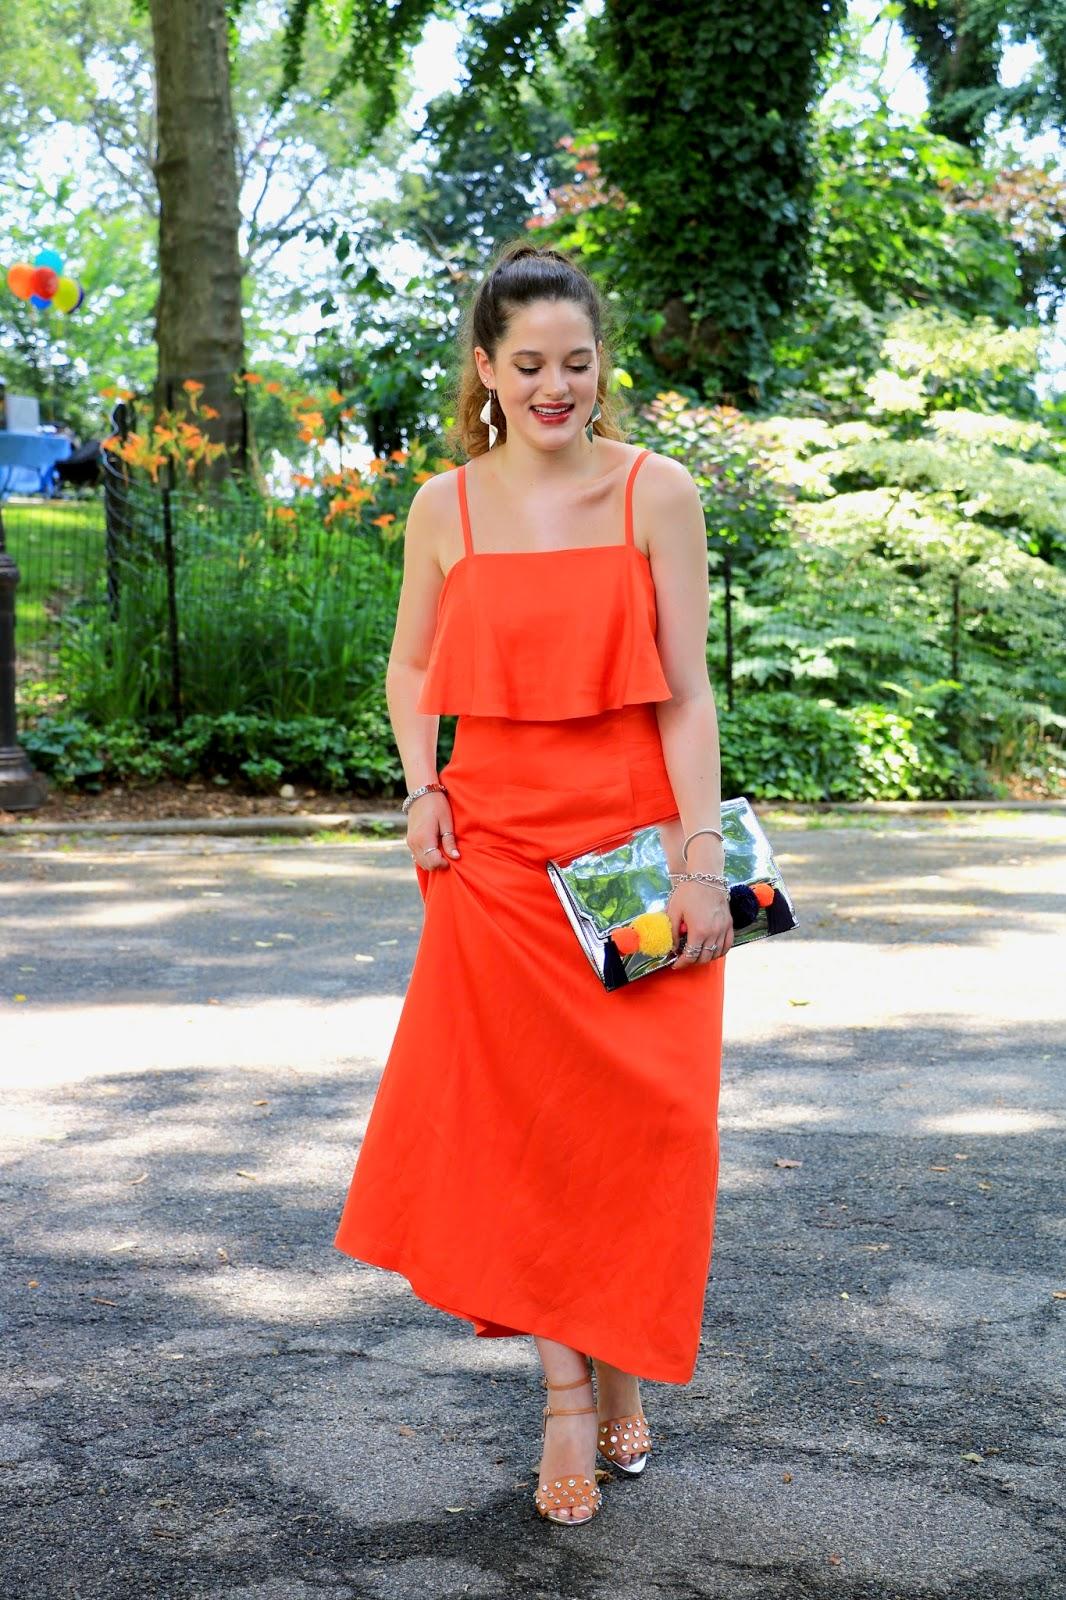 Fashion blogger Kathleen Harper of Kat's Fashion Fix wearing an orange maxi dress